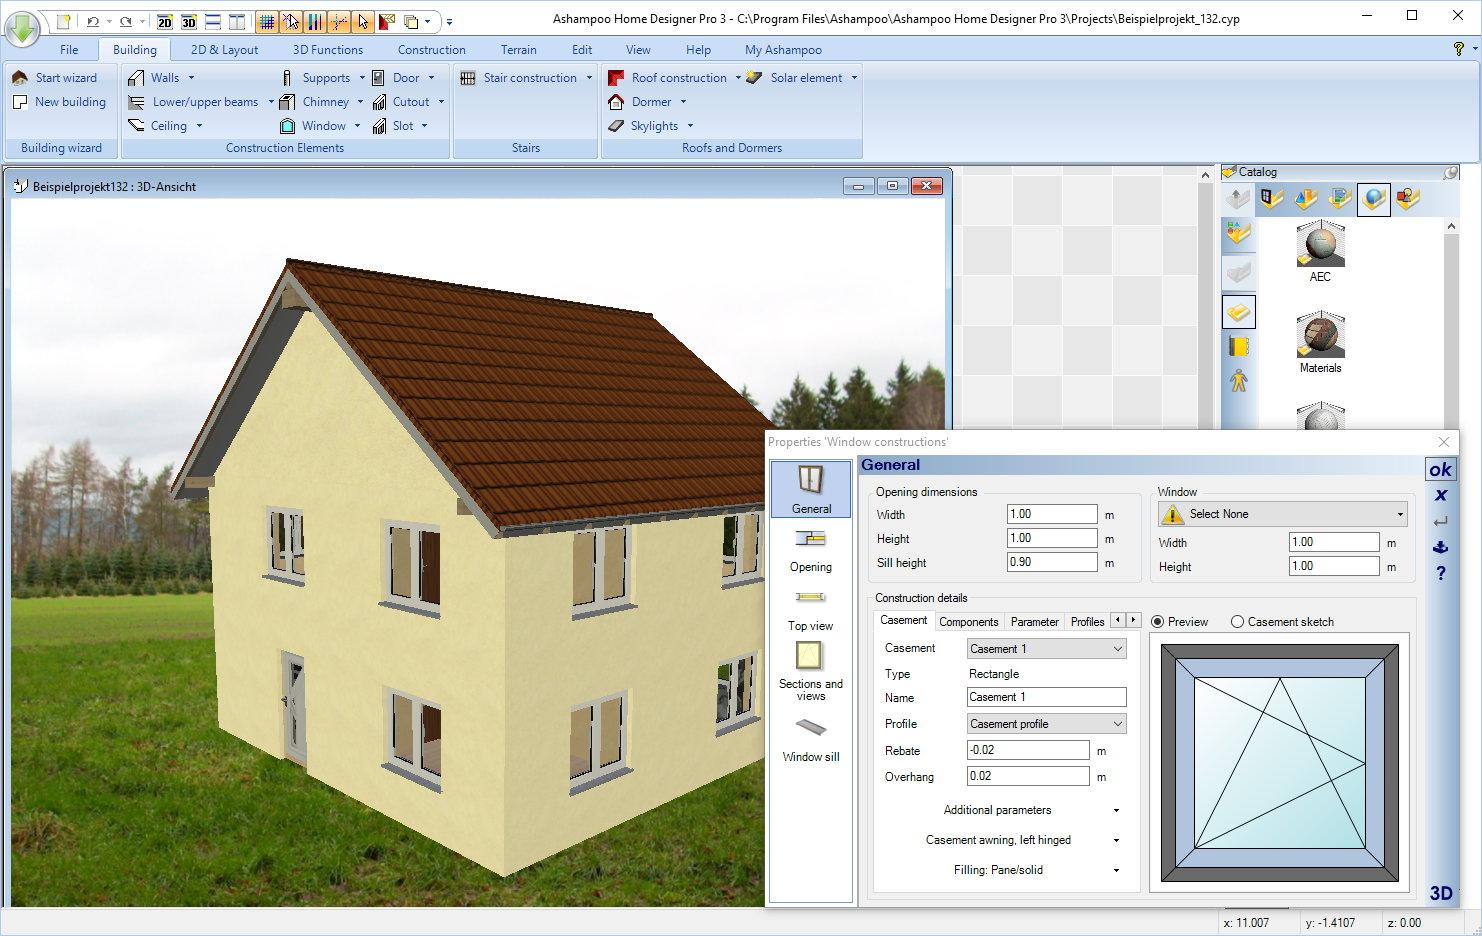 Ashampoo Home Designer Pro 3, planla, tasarla, dekore et, hayal evi, Ashampoo Home Designer, Home Designer Pro 3